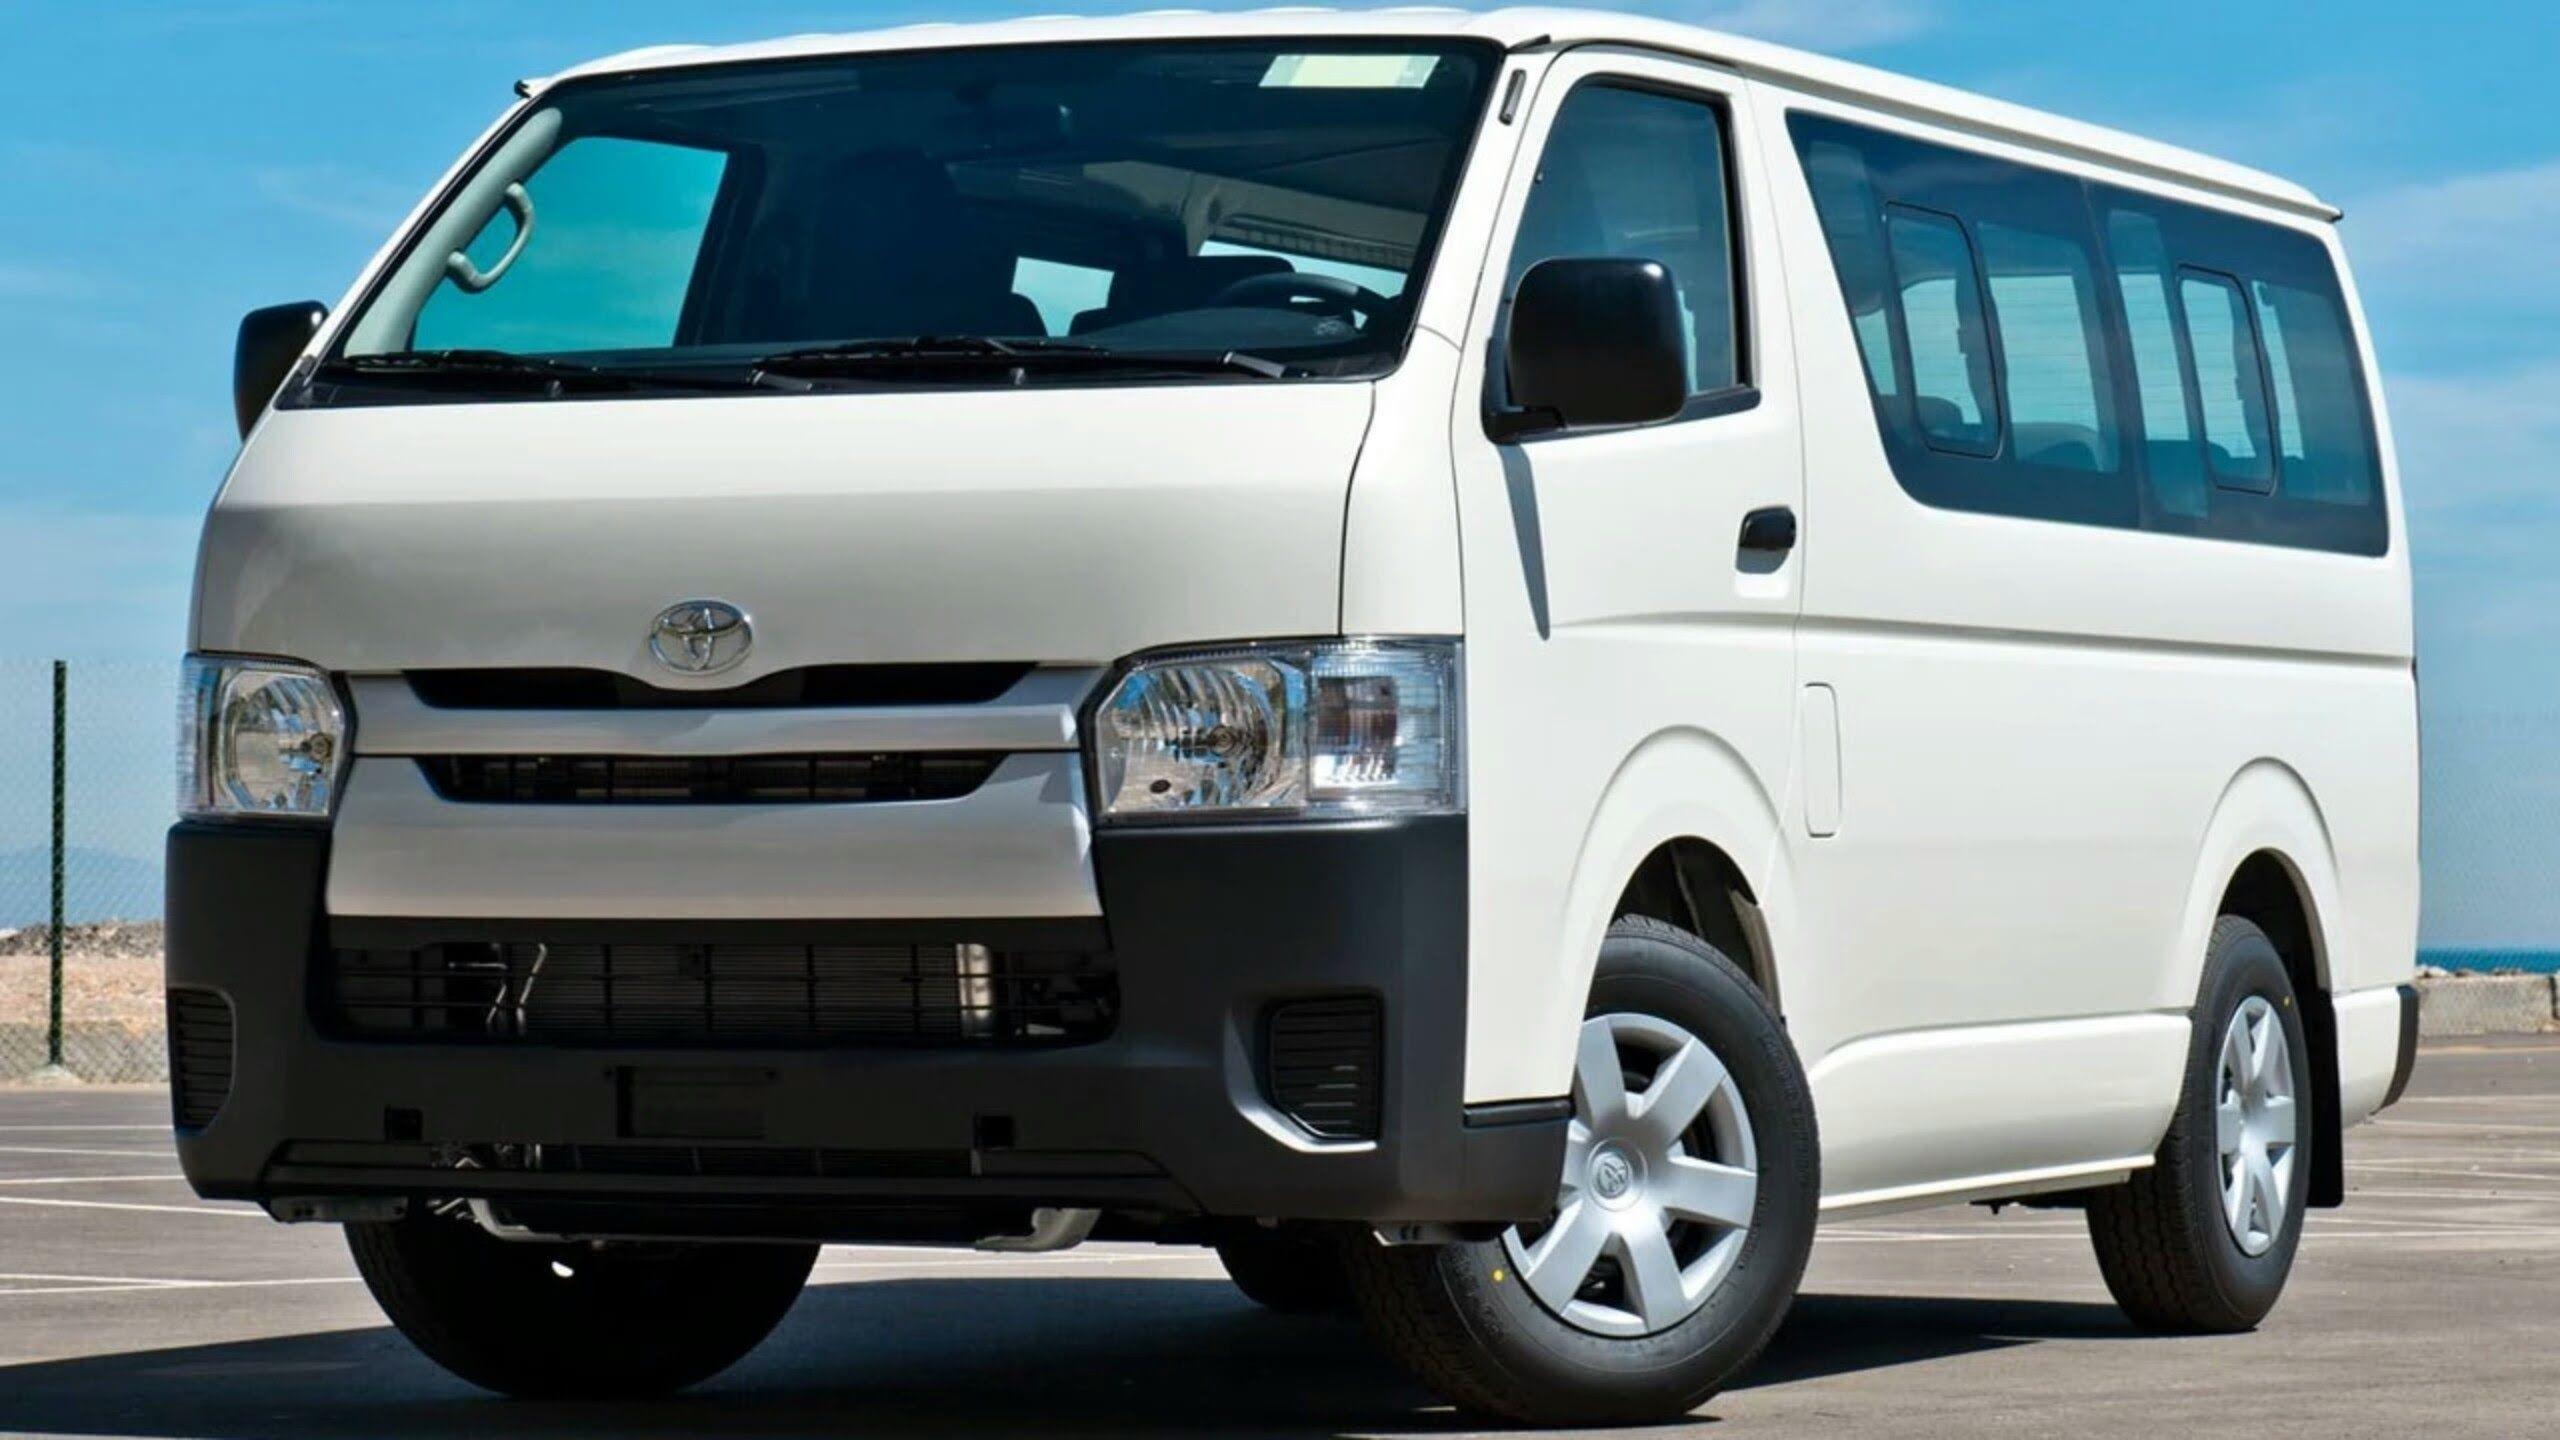 Kekurangan Harga Toyota Hiace 2018 Tangguh